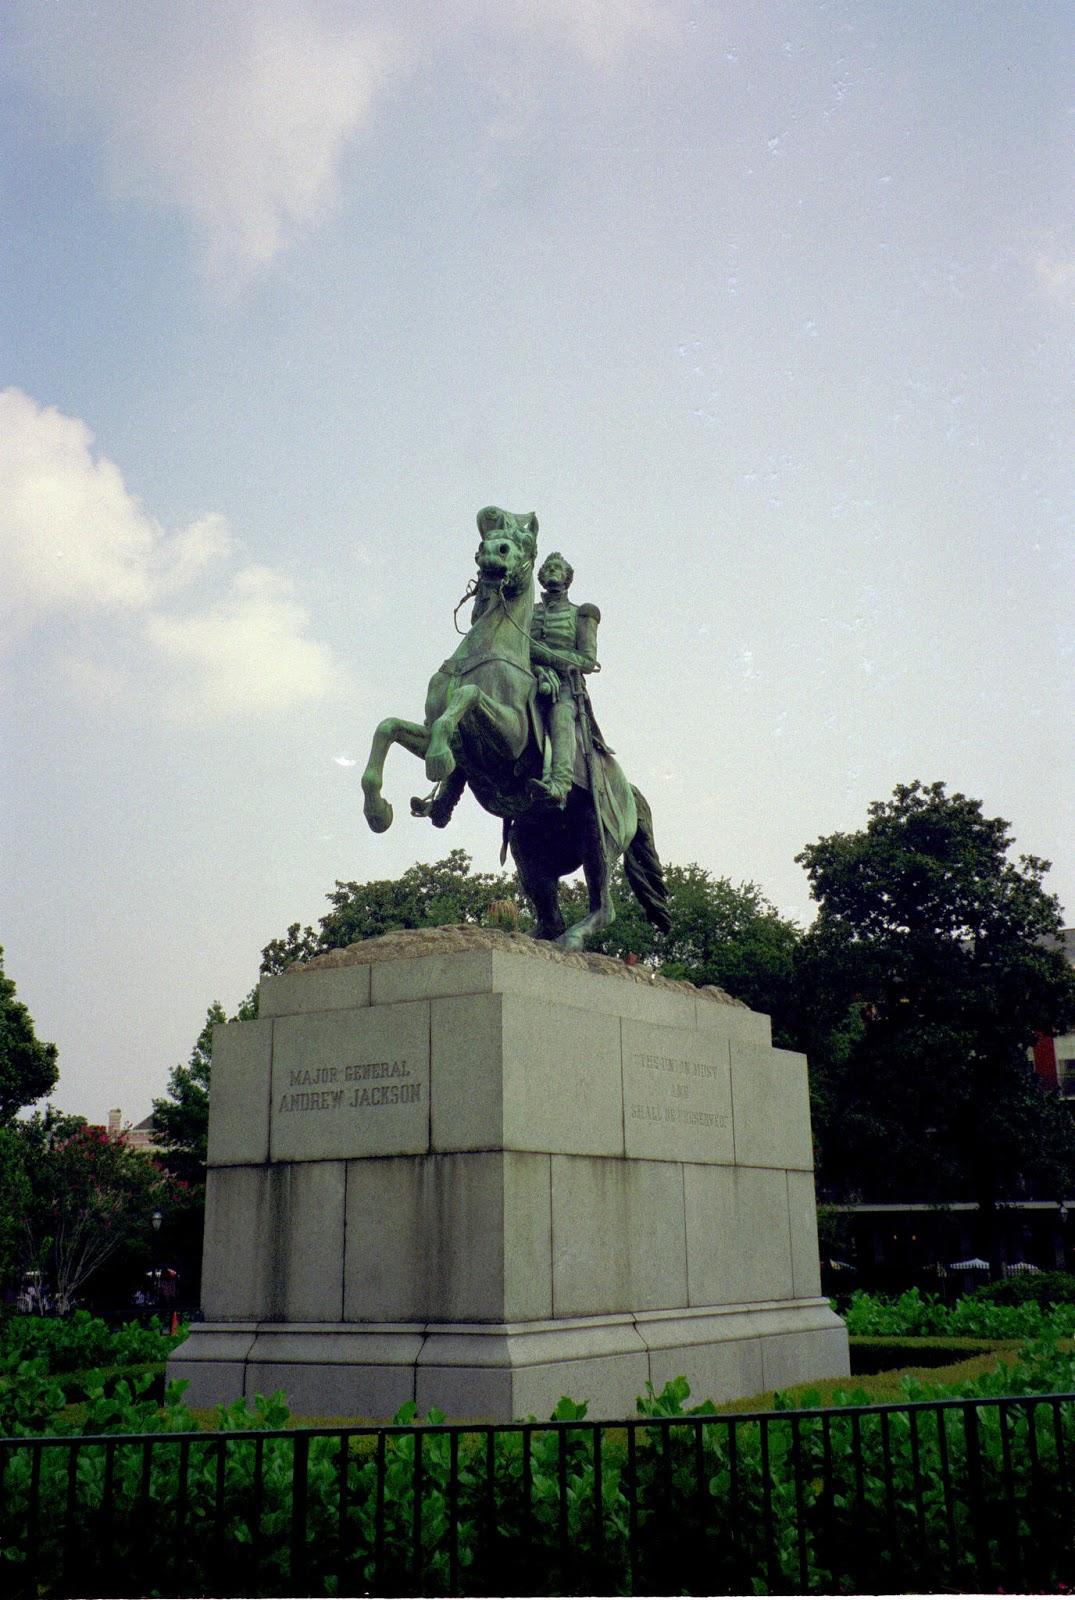 Jackson on a Horse